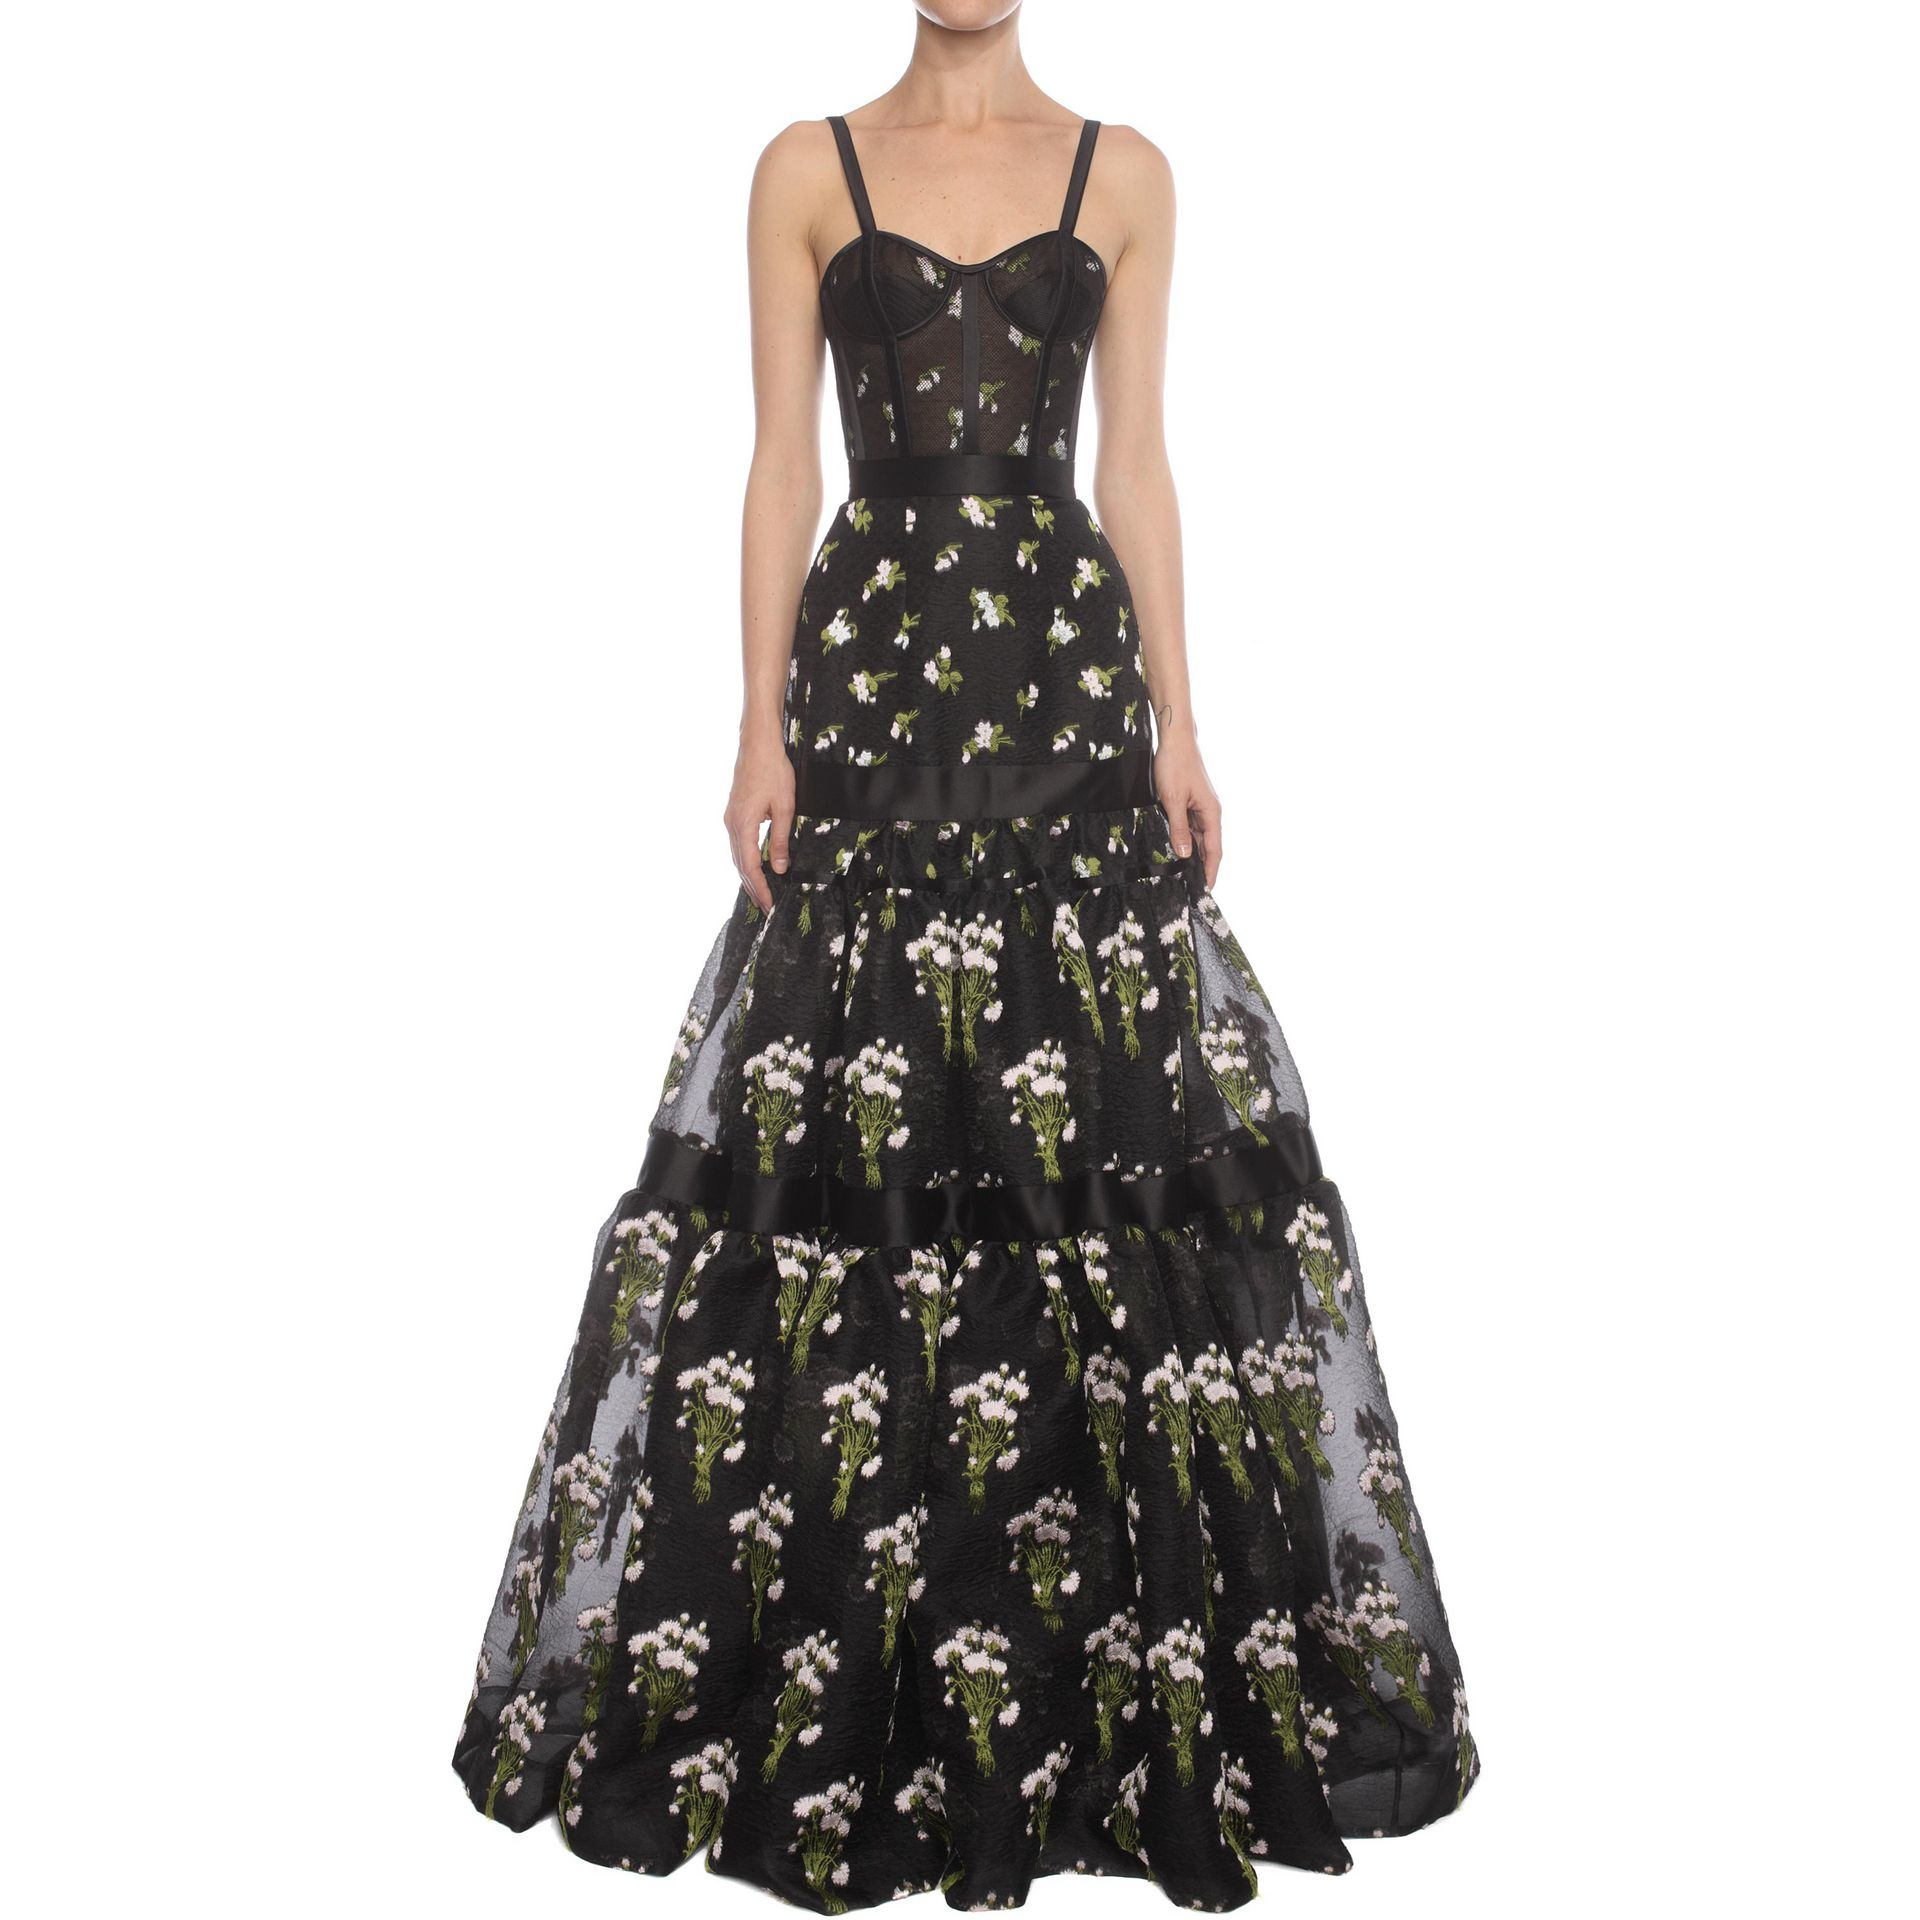 Alexander mcqueen Long Tier Violet Jacquard Dress | Lyst